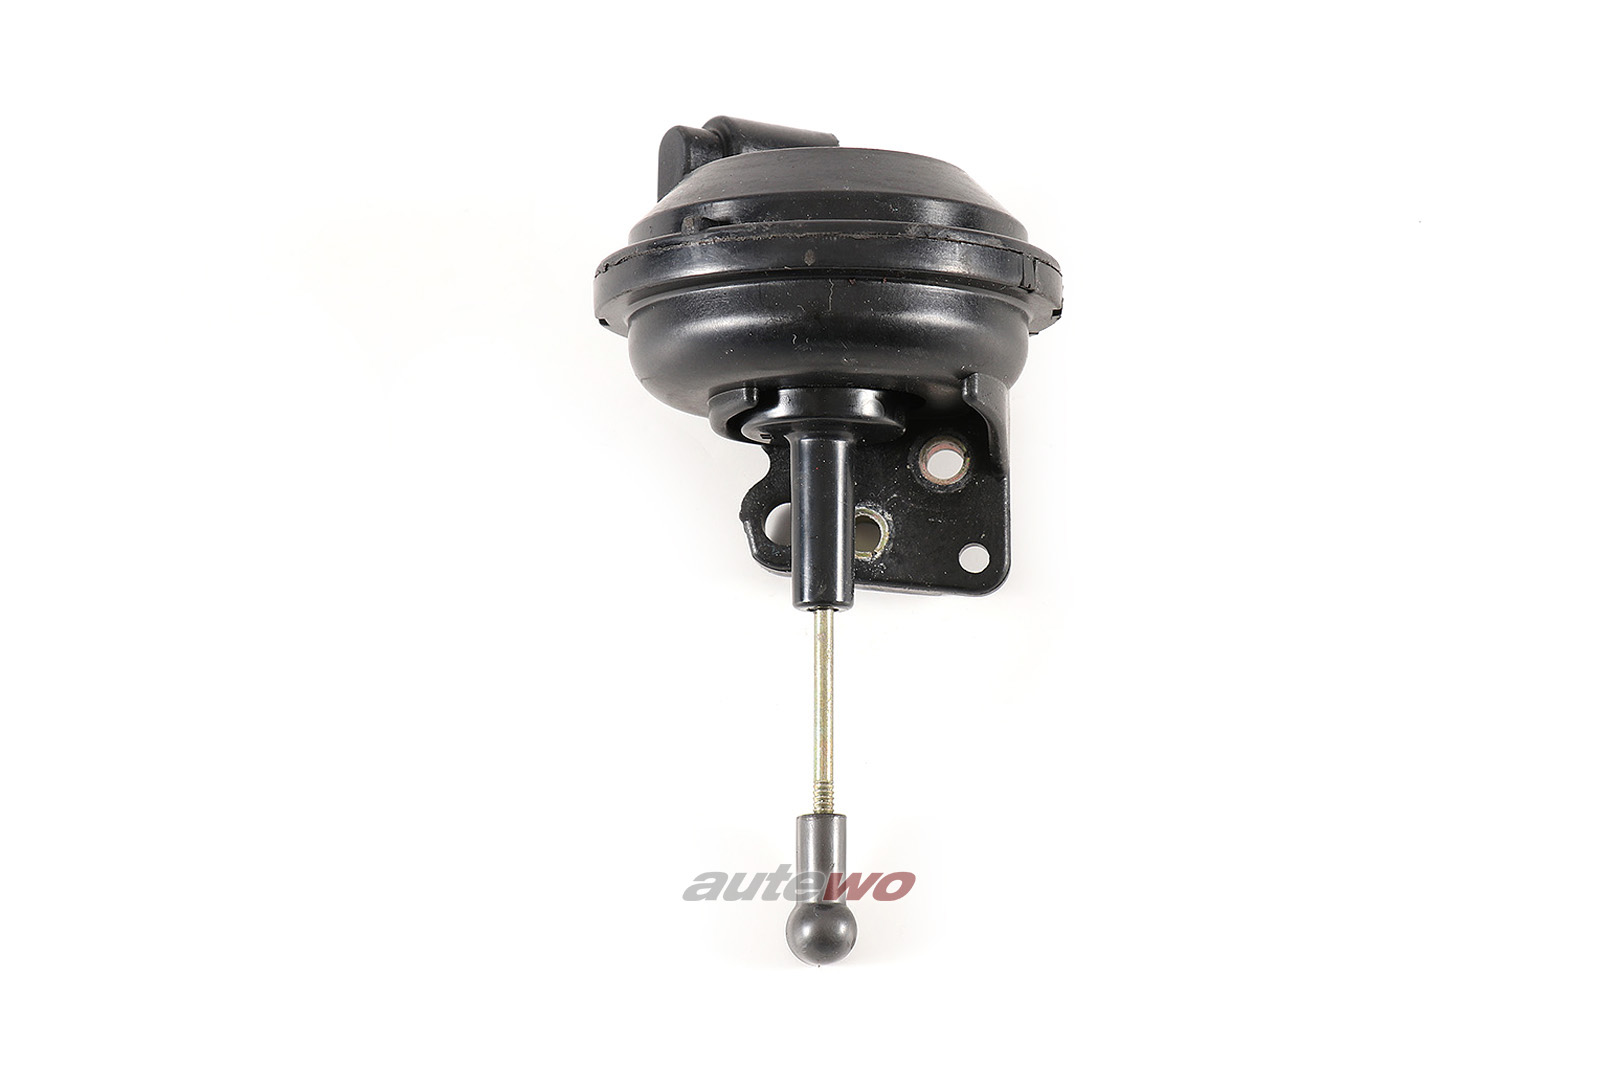 078133159A Audi 80 B4/Coupe/Cabrio/A4/100/A6/A8 2.8l Unterdruckdose Saugrohr